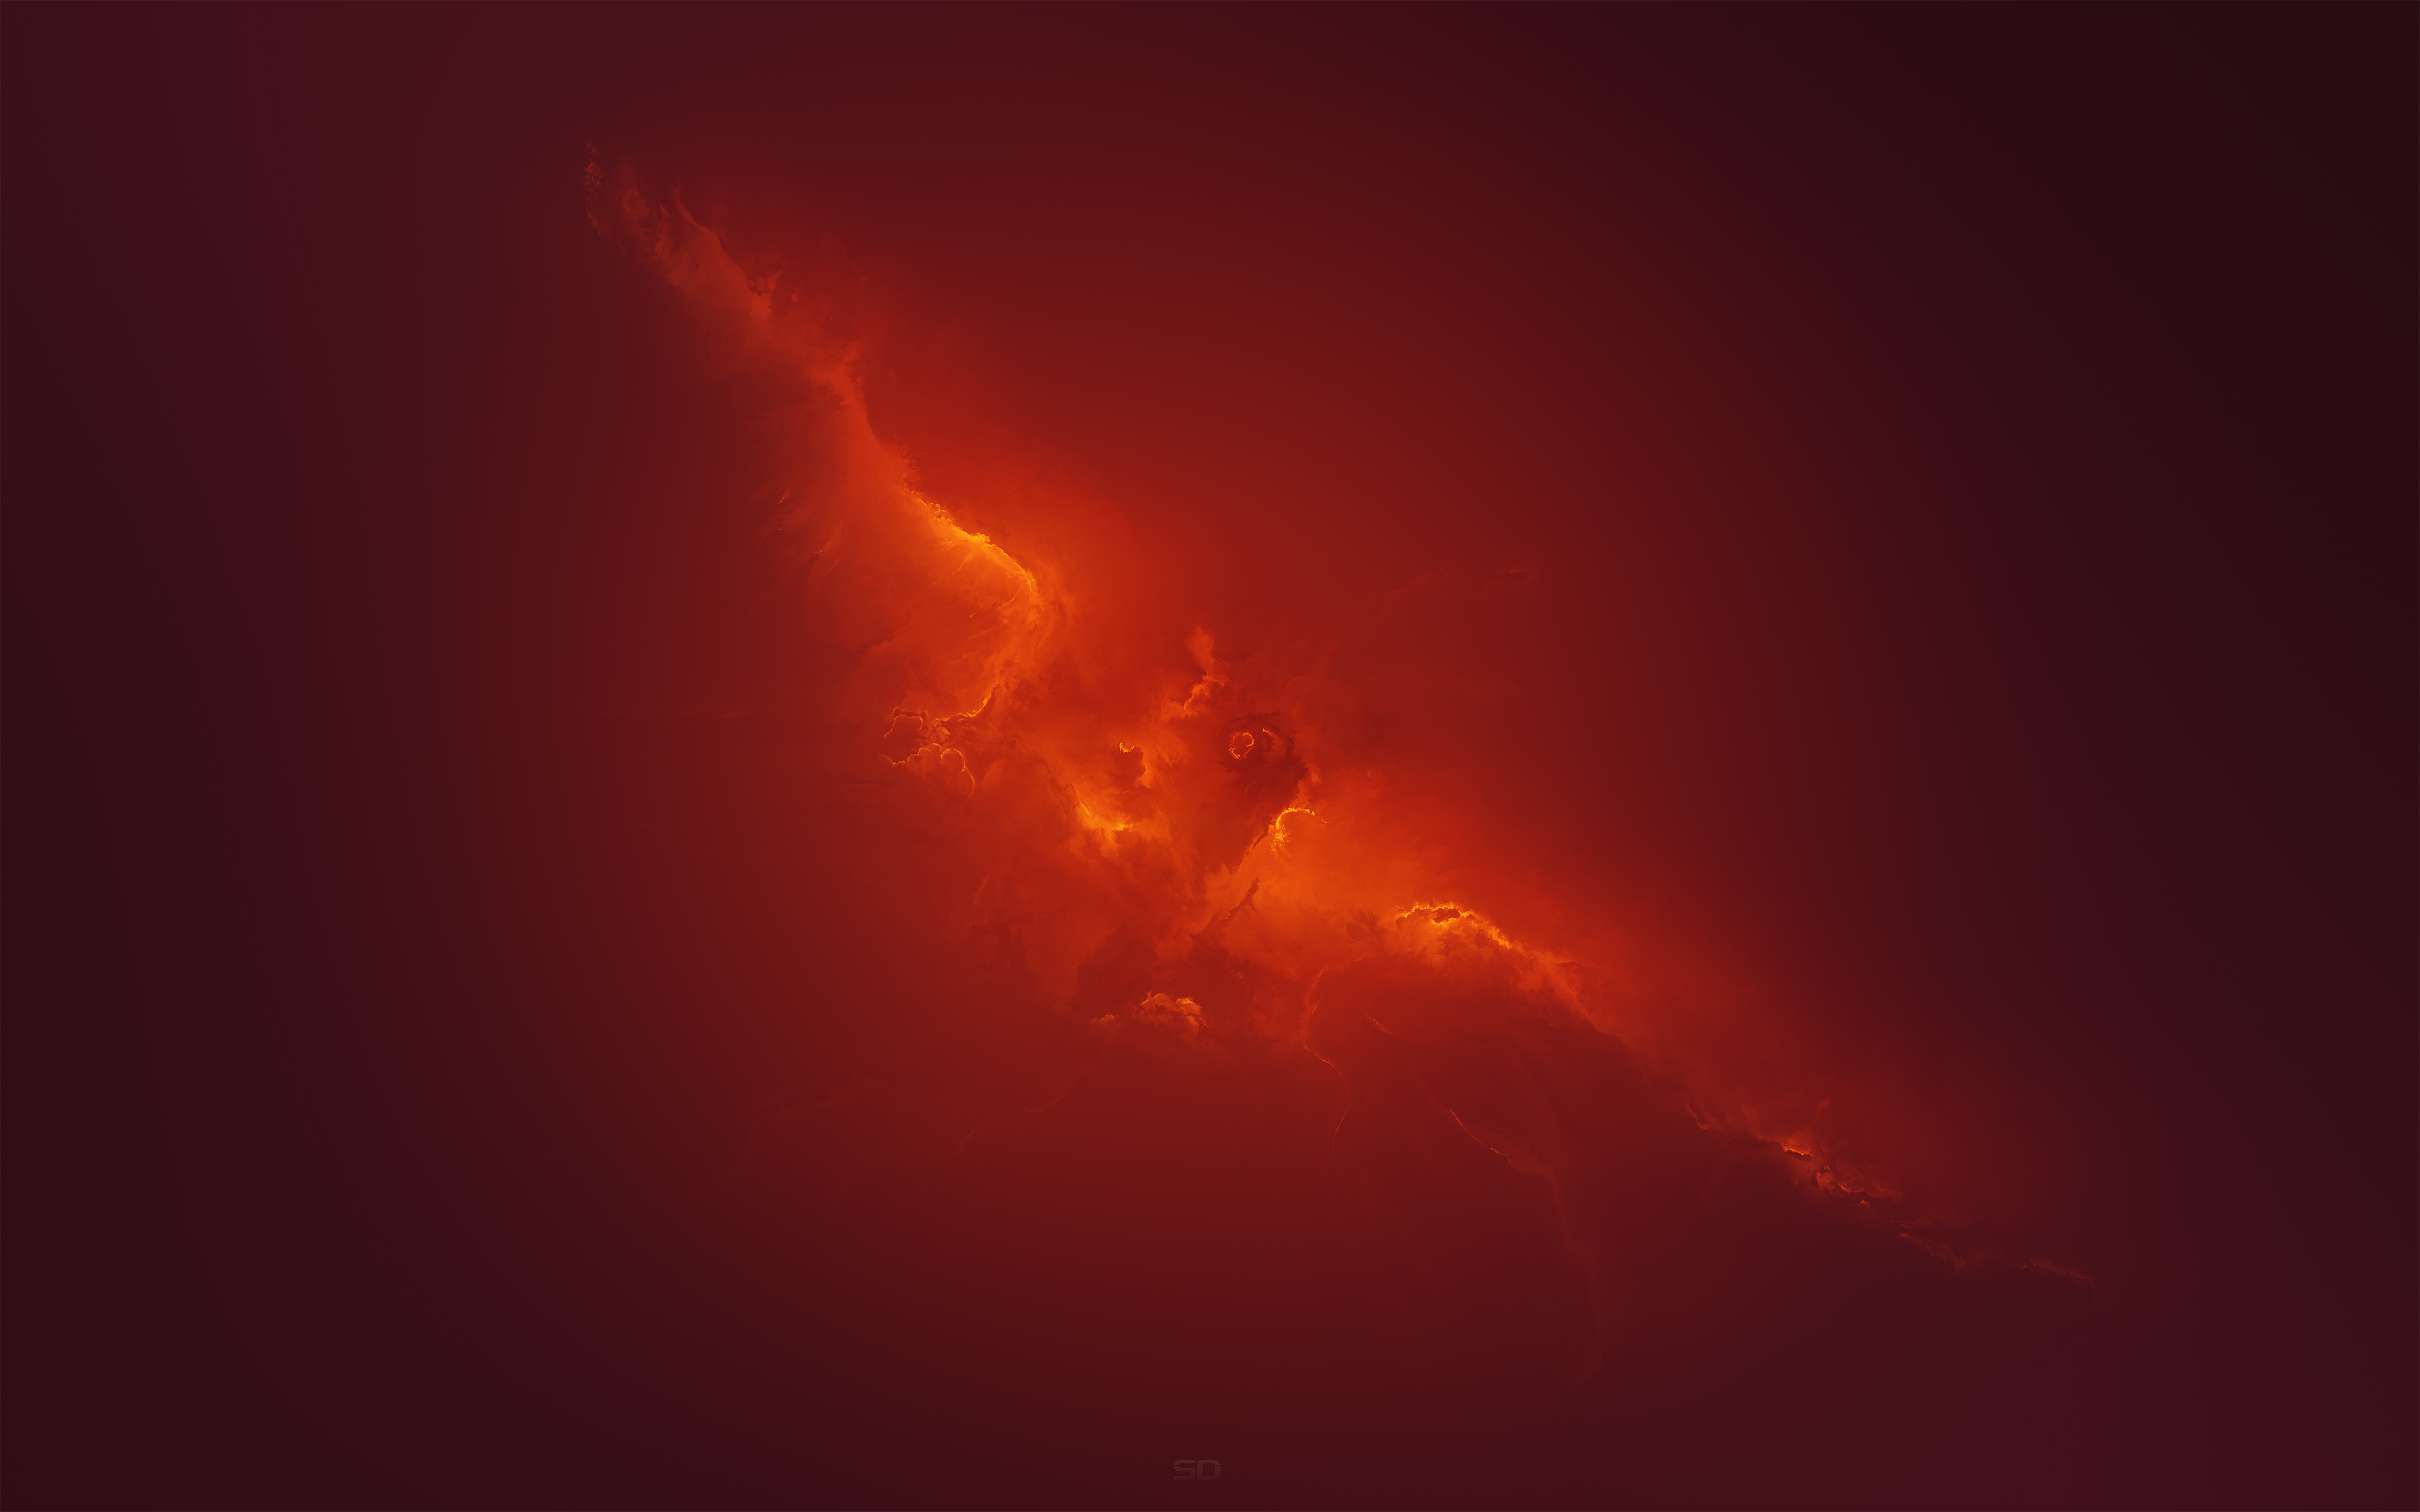 phoenix in red clouds 1574943076 - Phoenix In Red Clouds -